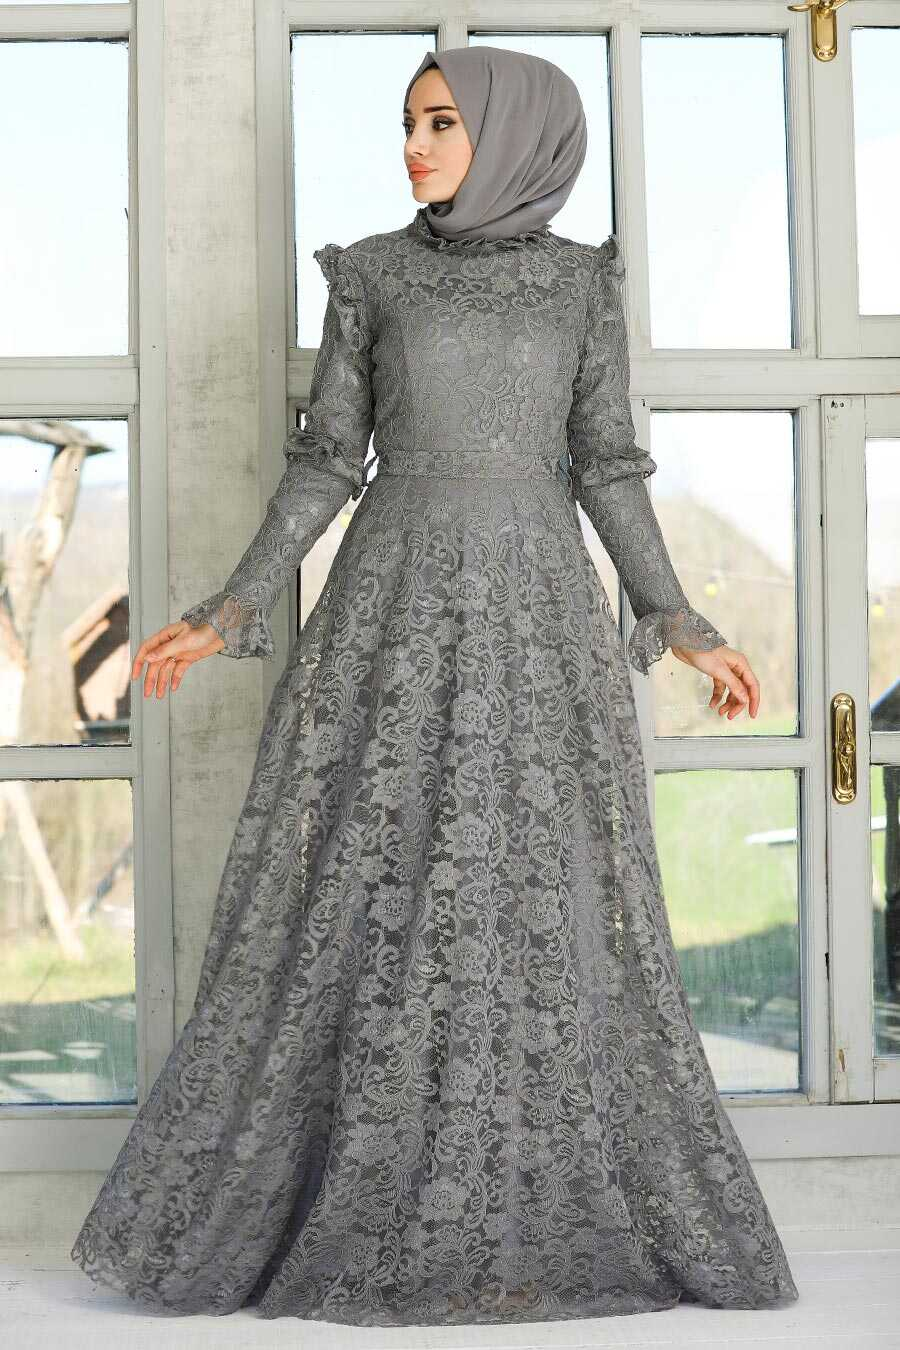 Grey Hijab Evening Dress 54750GR